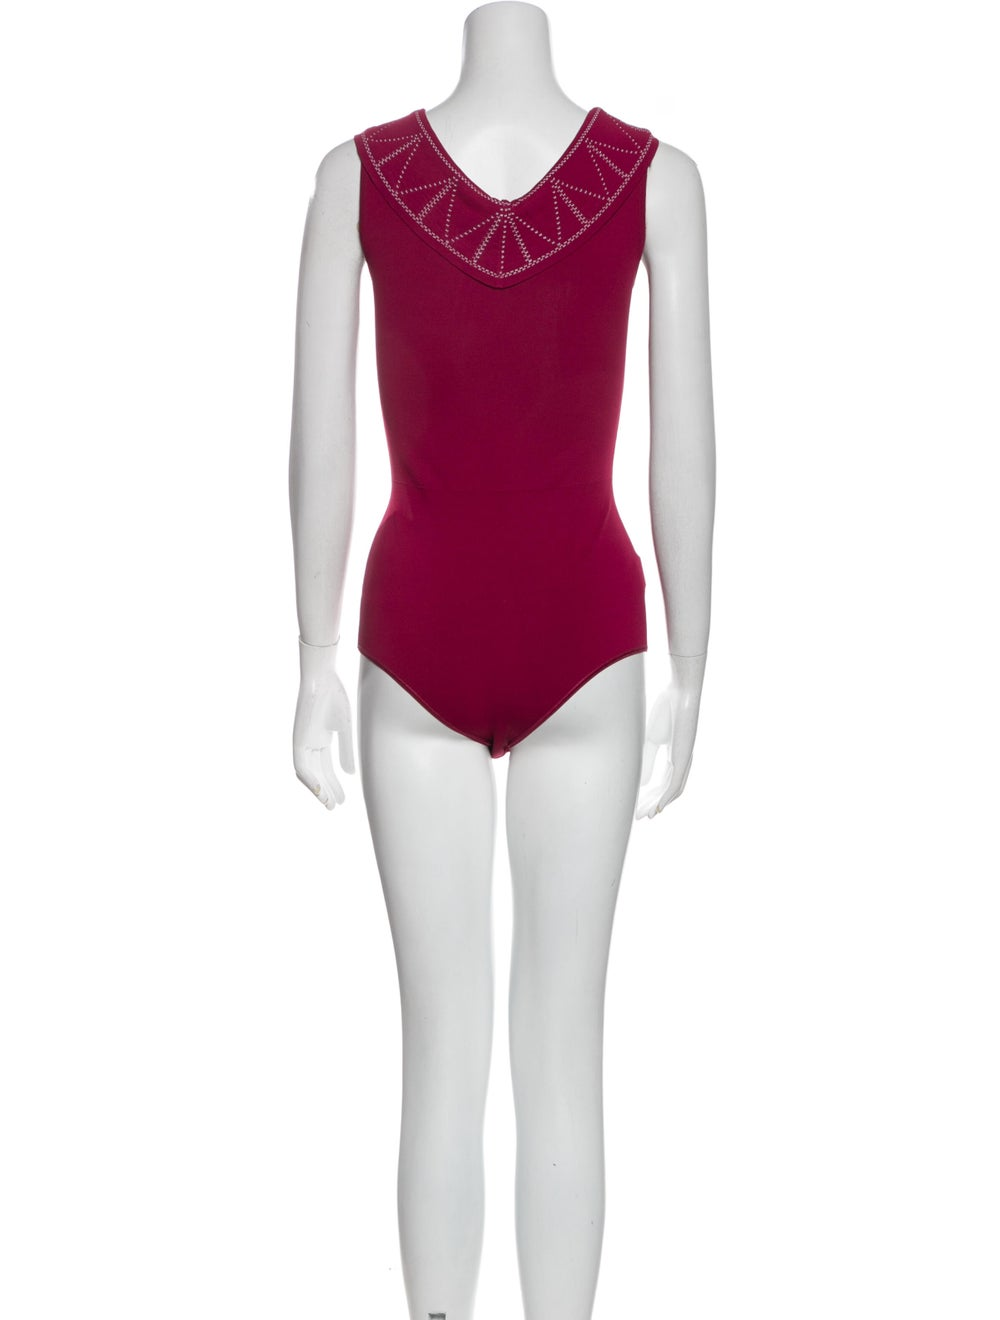 Alaïa 2020 Embroidered Bodysuit Bodysuit - image 3